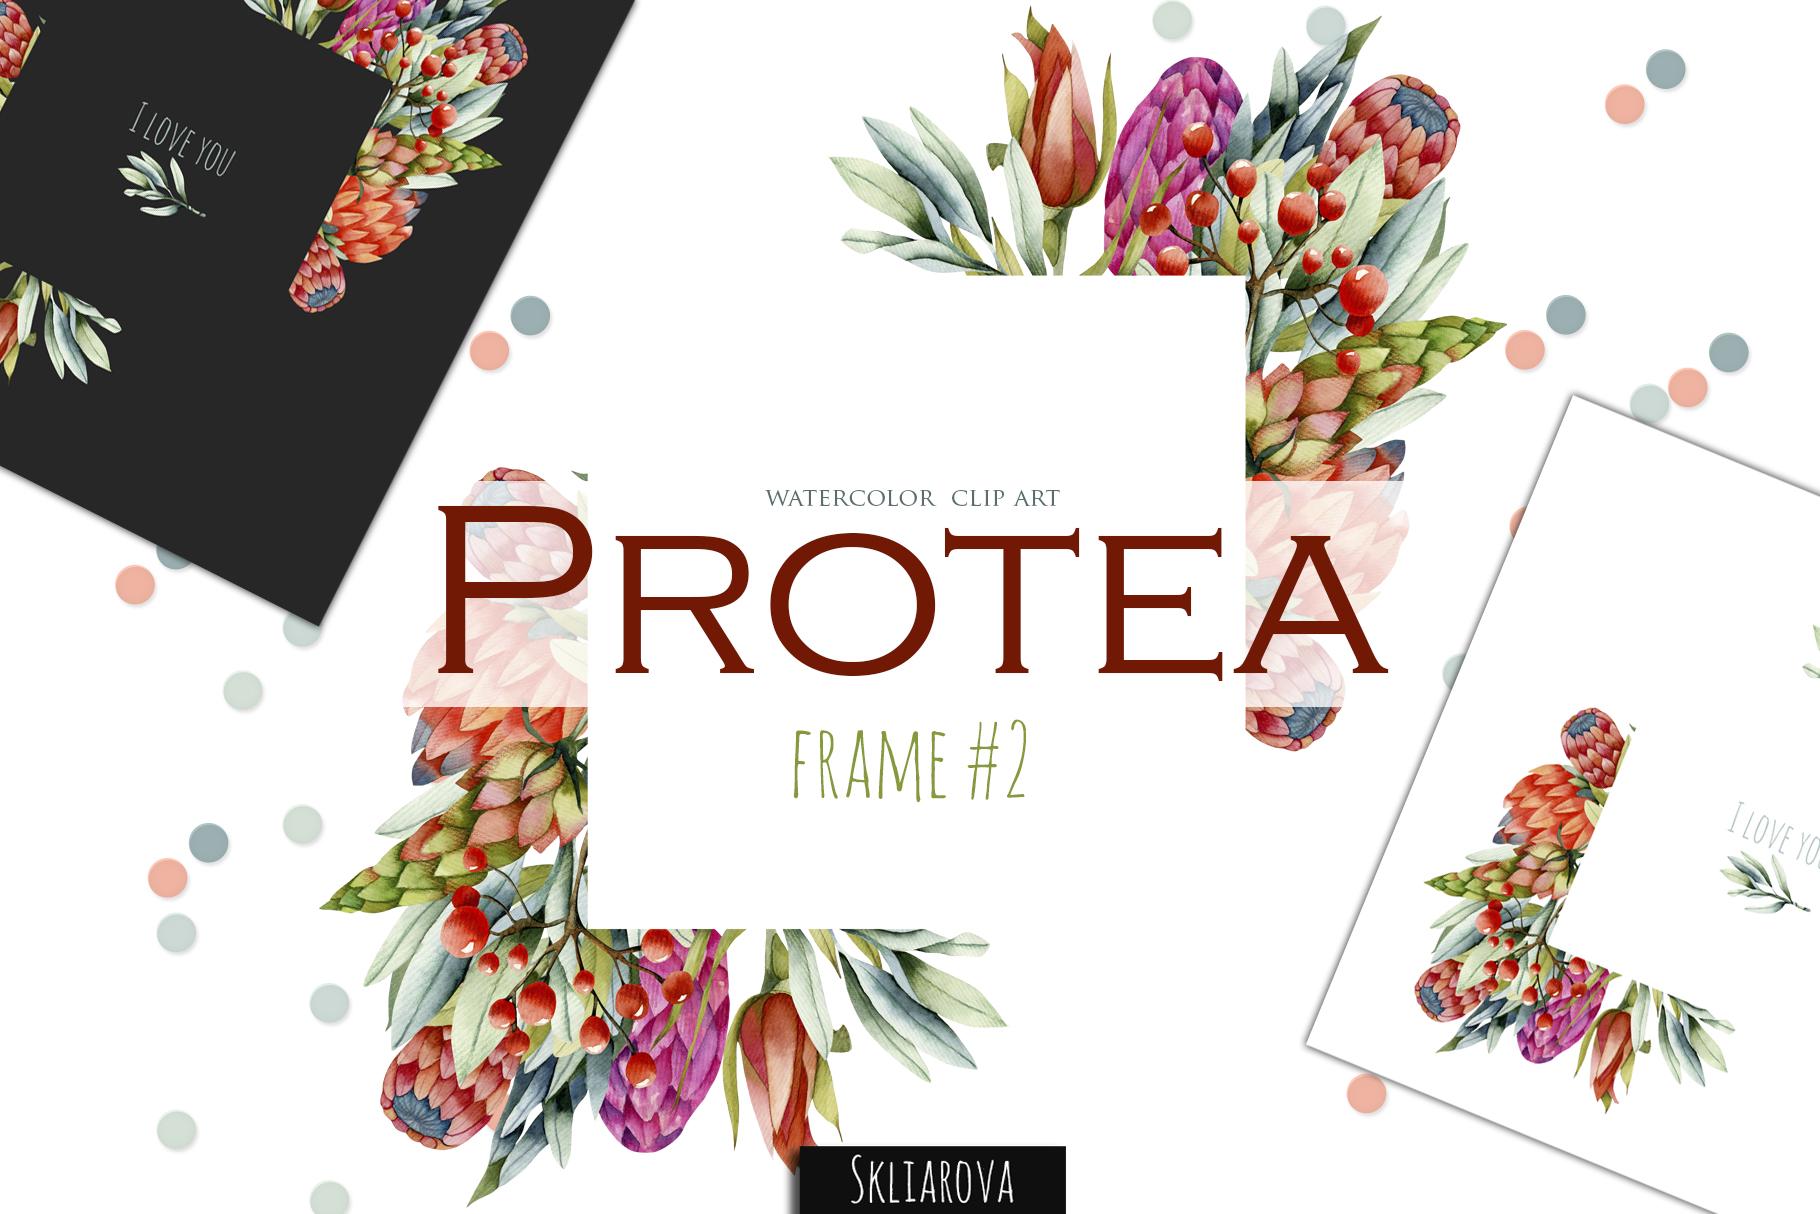 Protea. Frame #2 example image 1